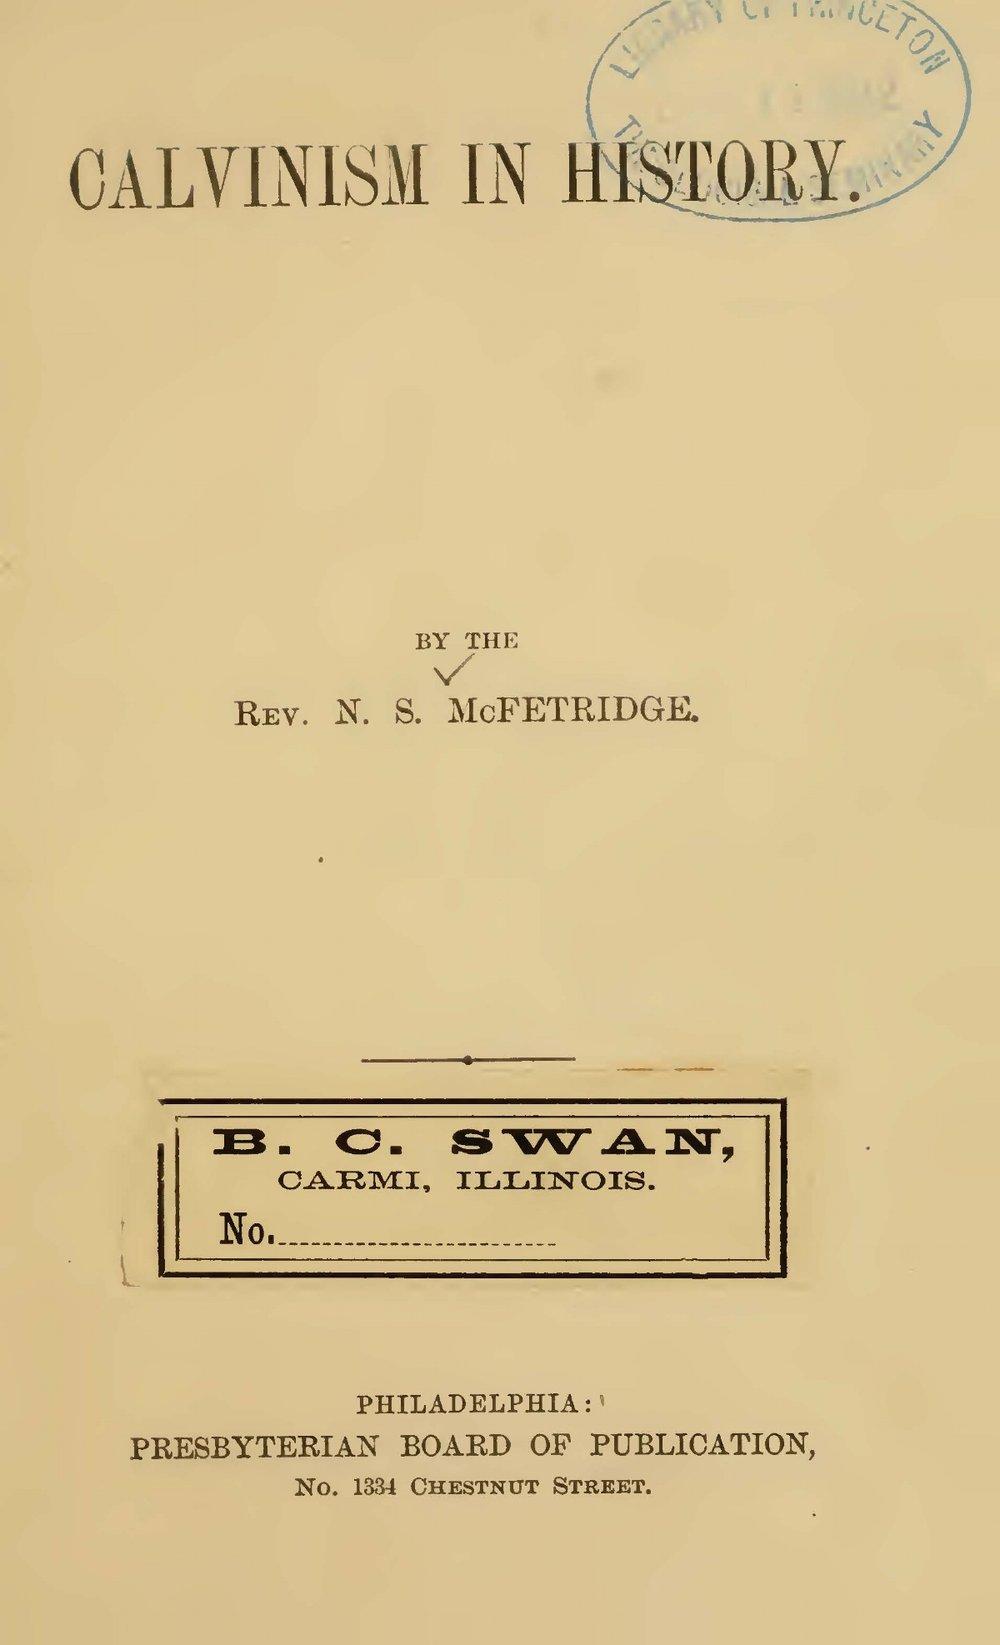 McFetridge, Nathaniel Smyth, Calvinism in History Title Page.jpg